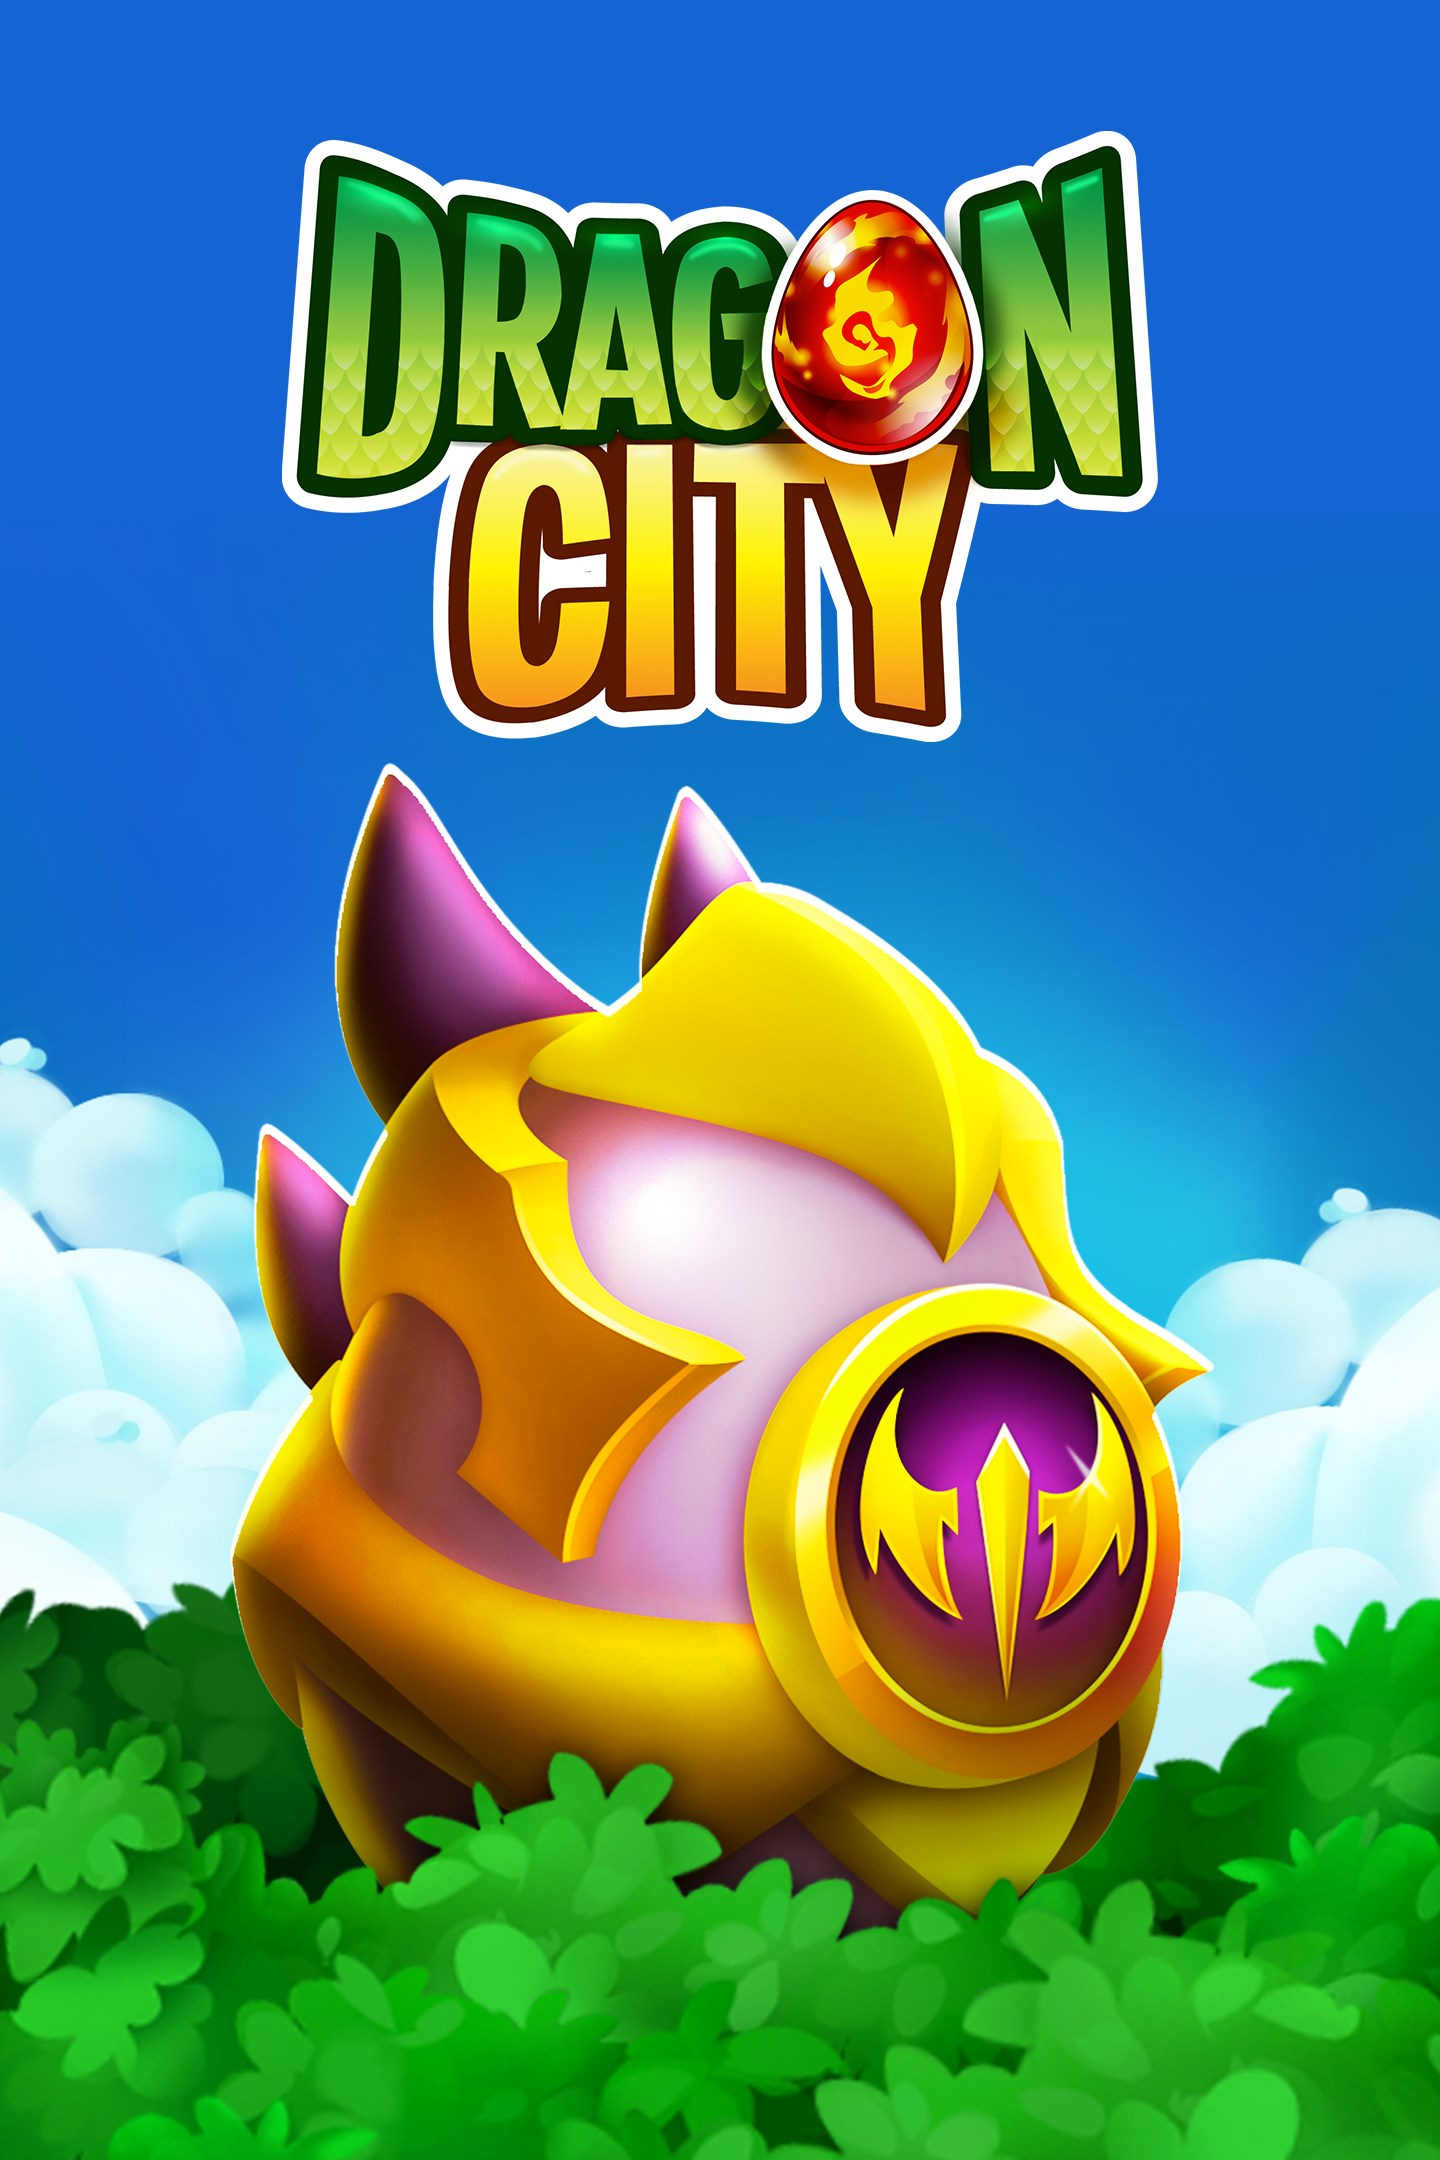 Get Dragon City - Microsoft Store en-IN